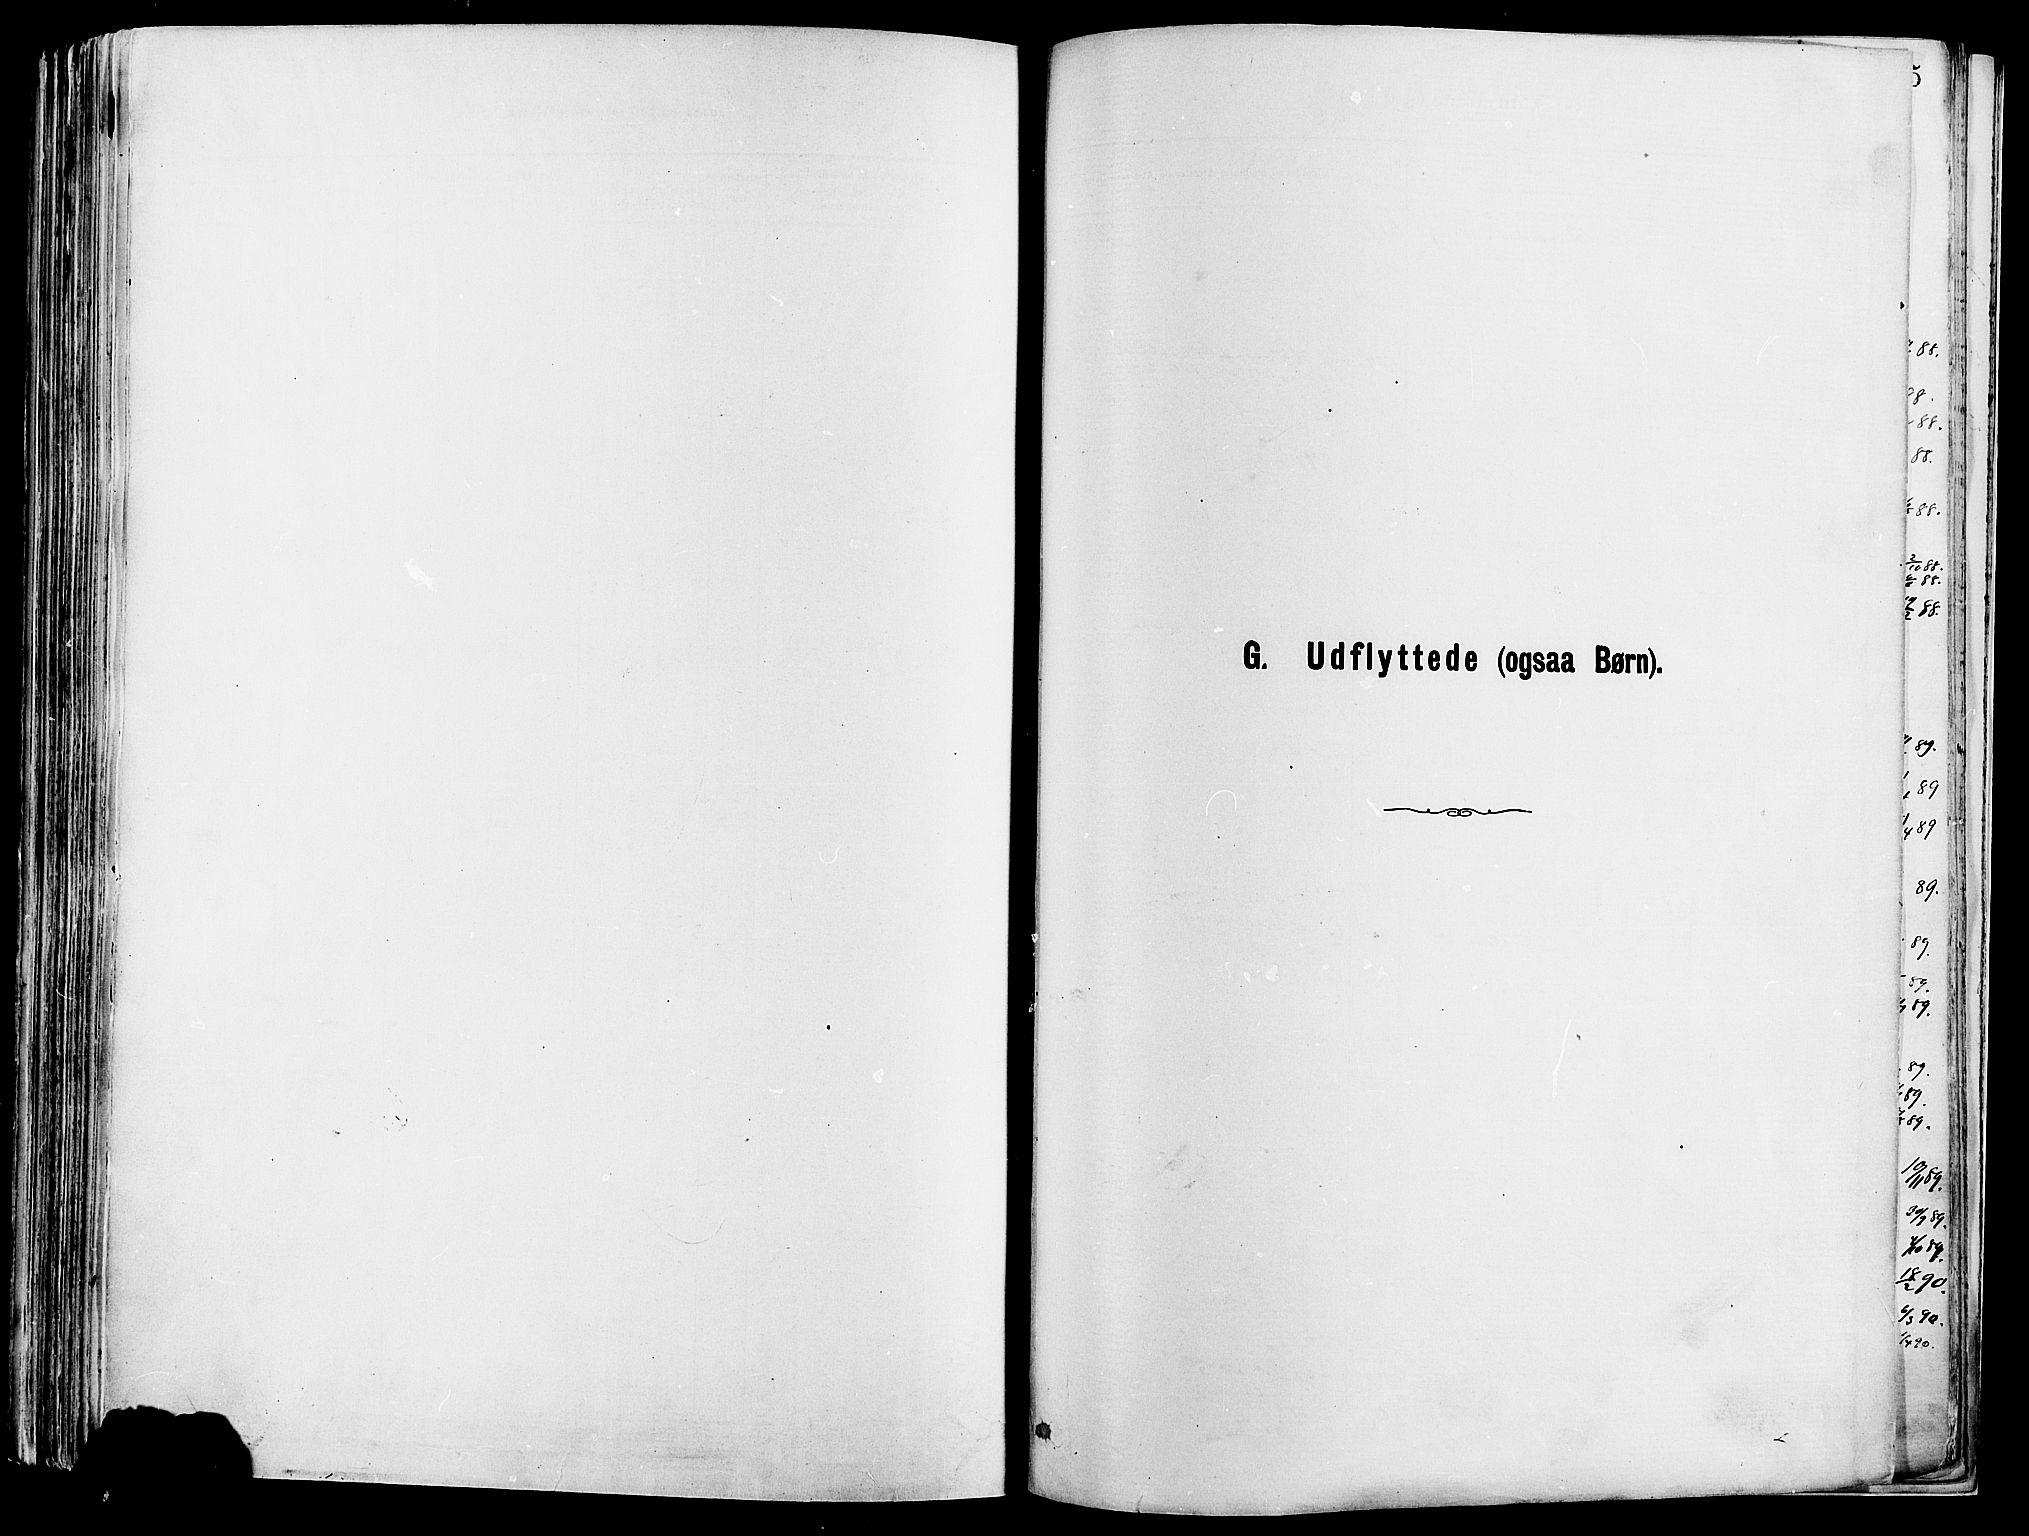 SAH, Vågå prestekontor, Ministerialbok nr. 8, 1886-1904